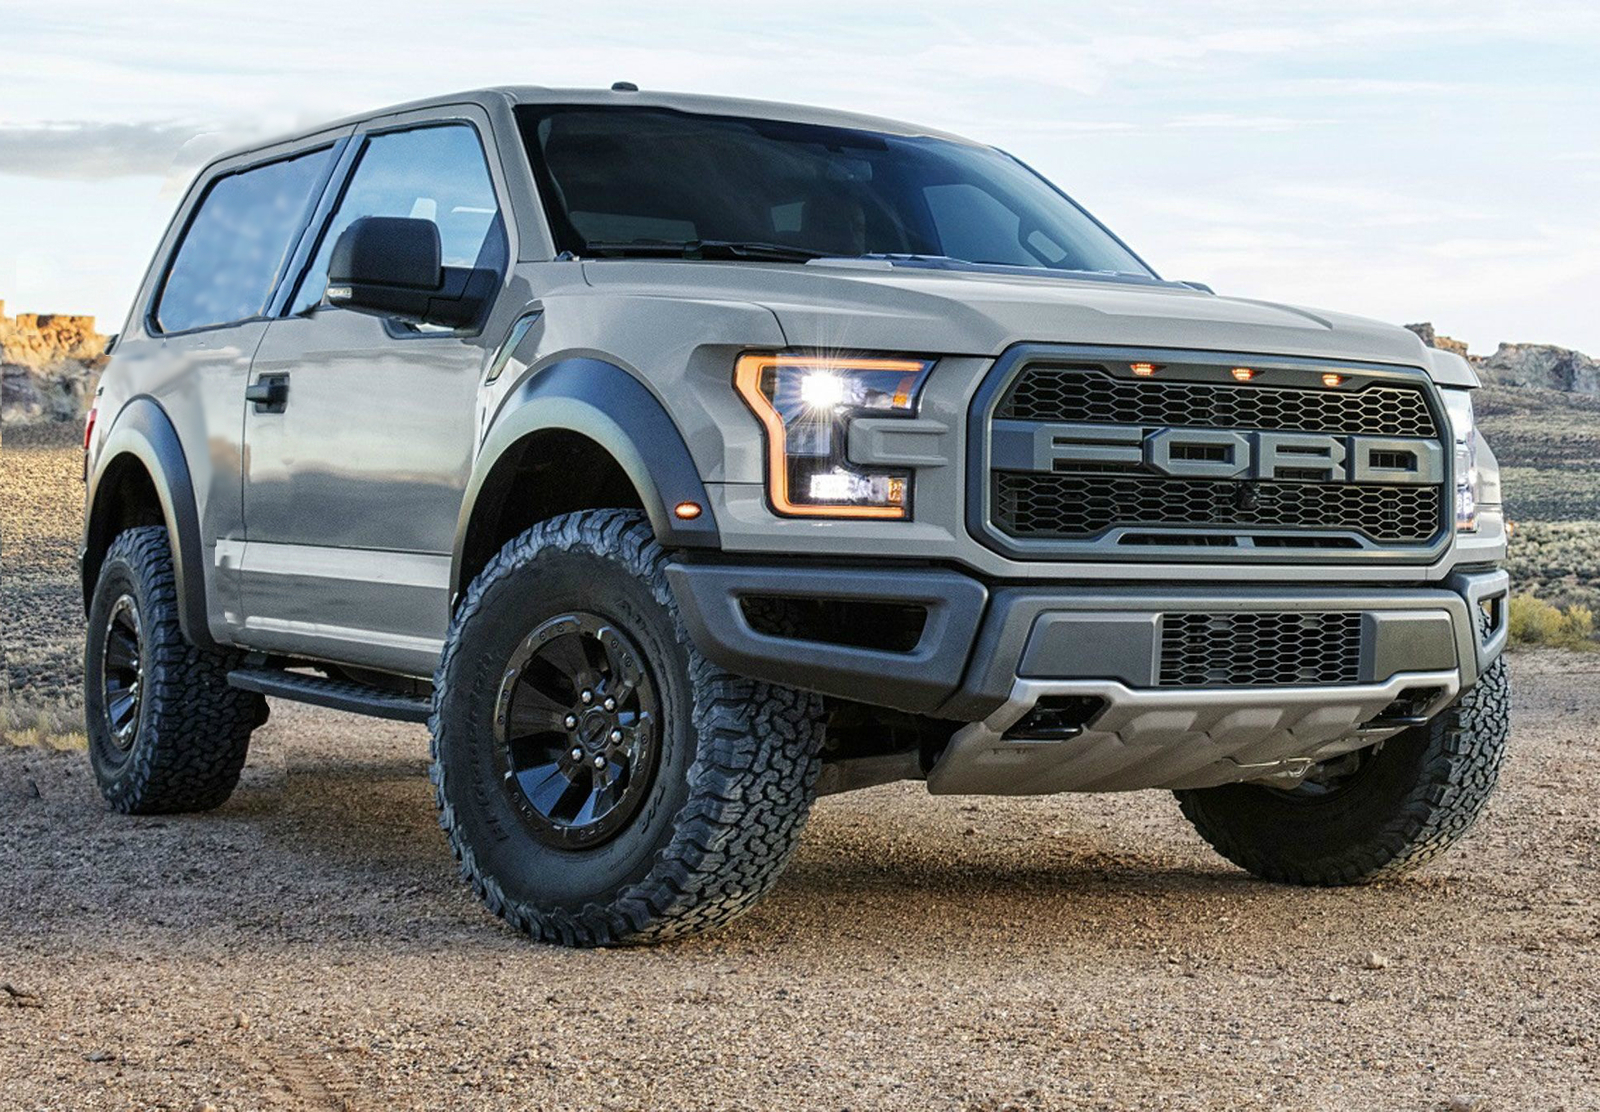 Ford_Bronco_concept_-_Flickr_-_dave_7.jpg